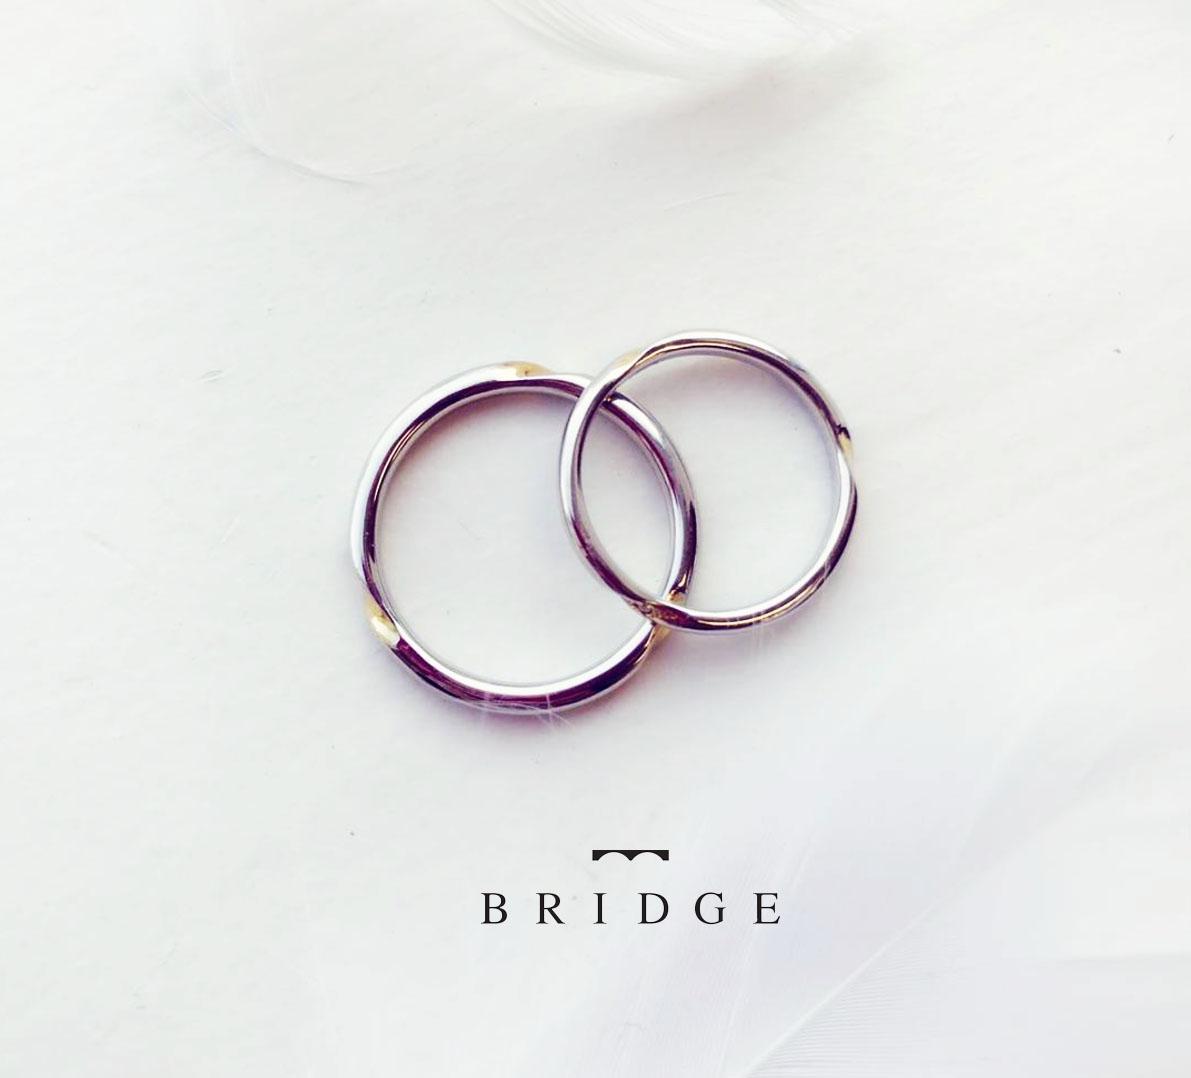 BRIDGE銀座ブリッジ光のメビウス置き撮り